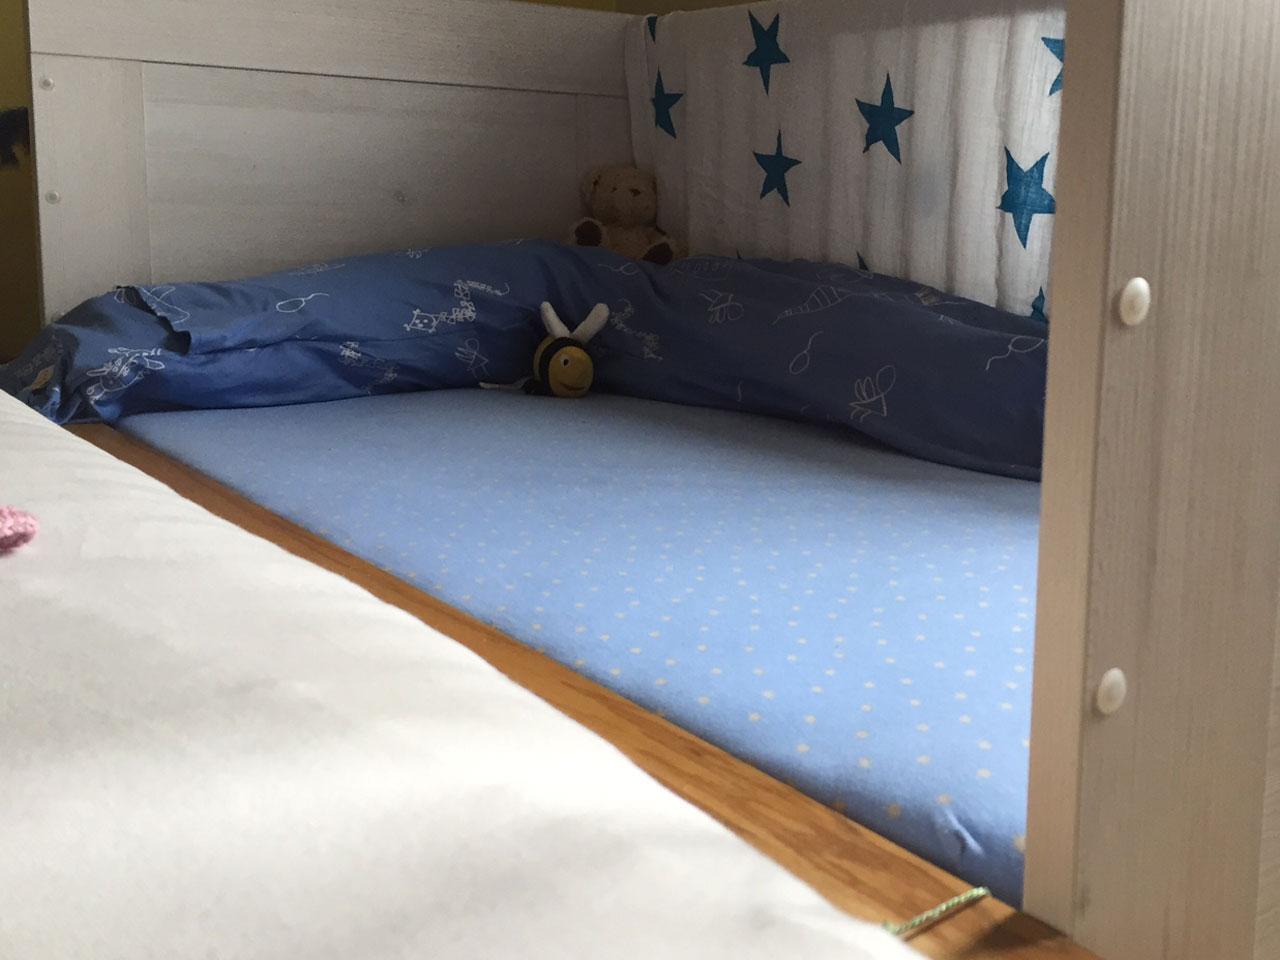 Fabulous Baby: Beistellbett aus Kinderbett bauen - Olivia Menzi UQ59